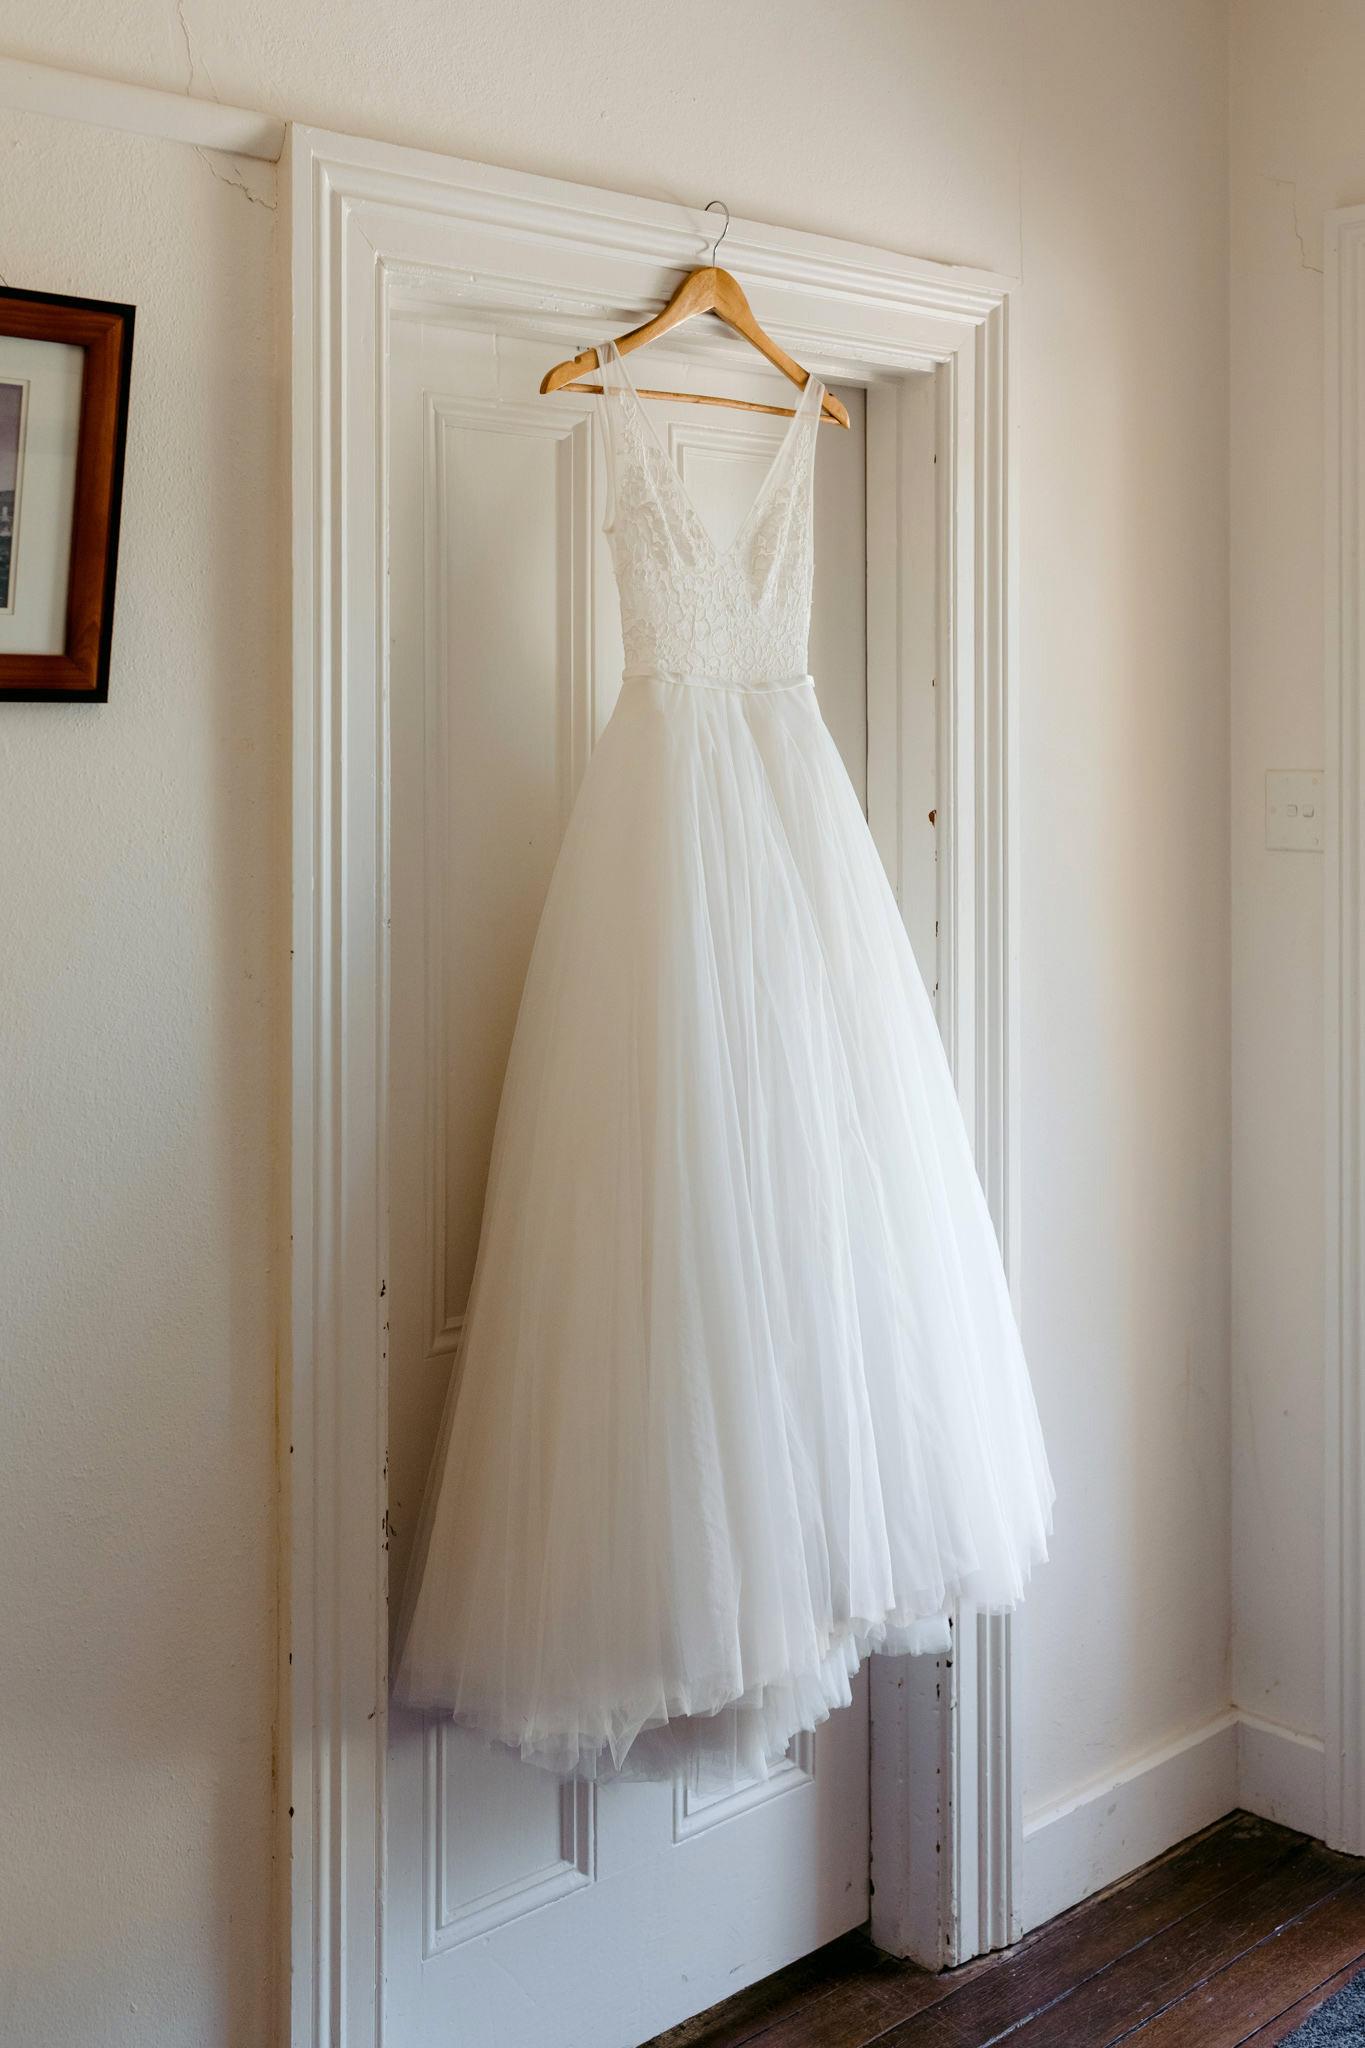 Erin_Latimore_Mudgee_Canberra_Wedding_Photographer_Tuggeranong_Homestead_004.JPG